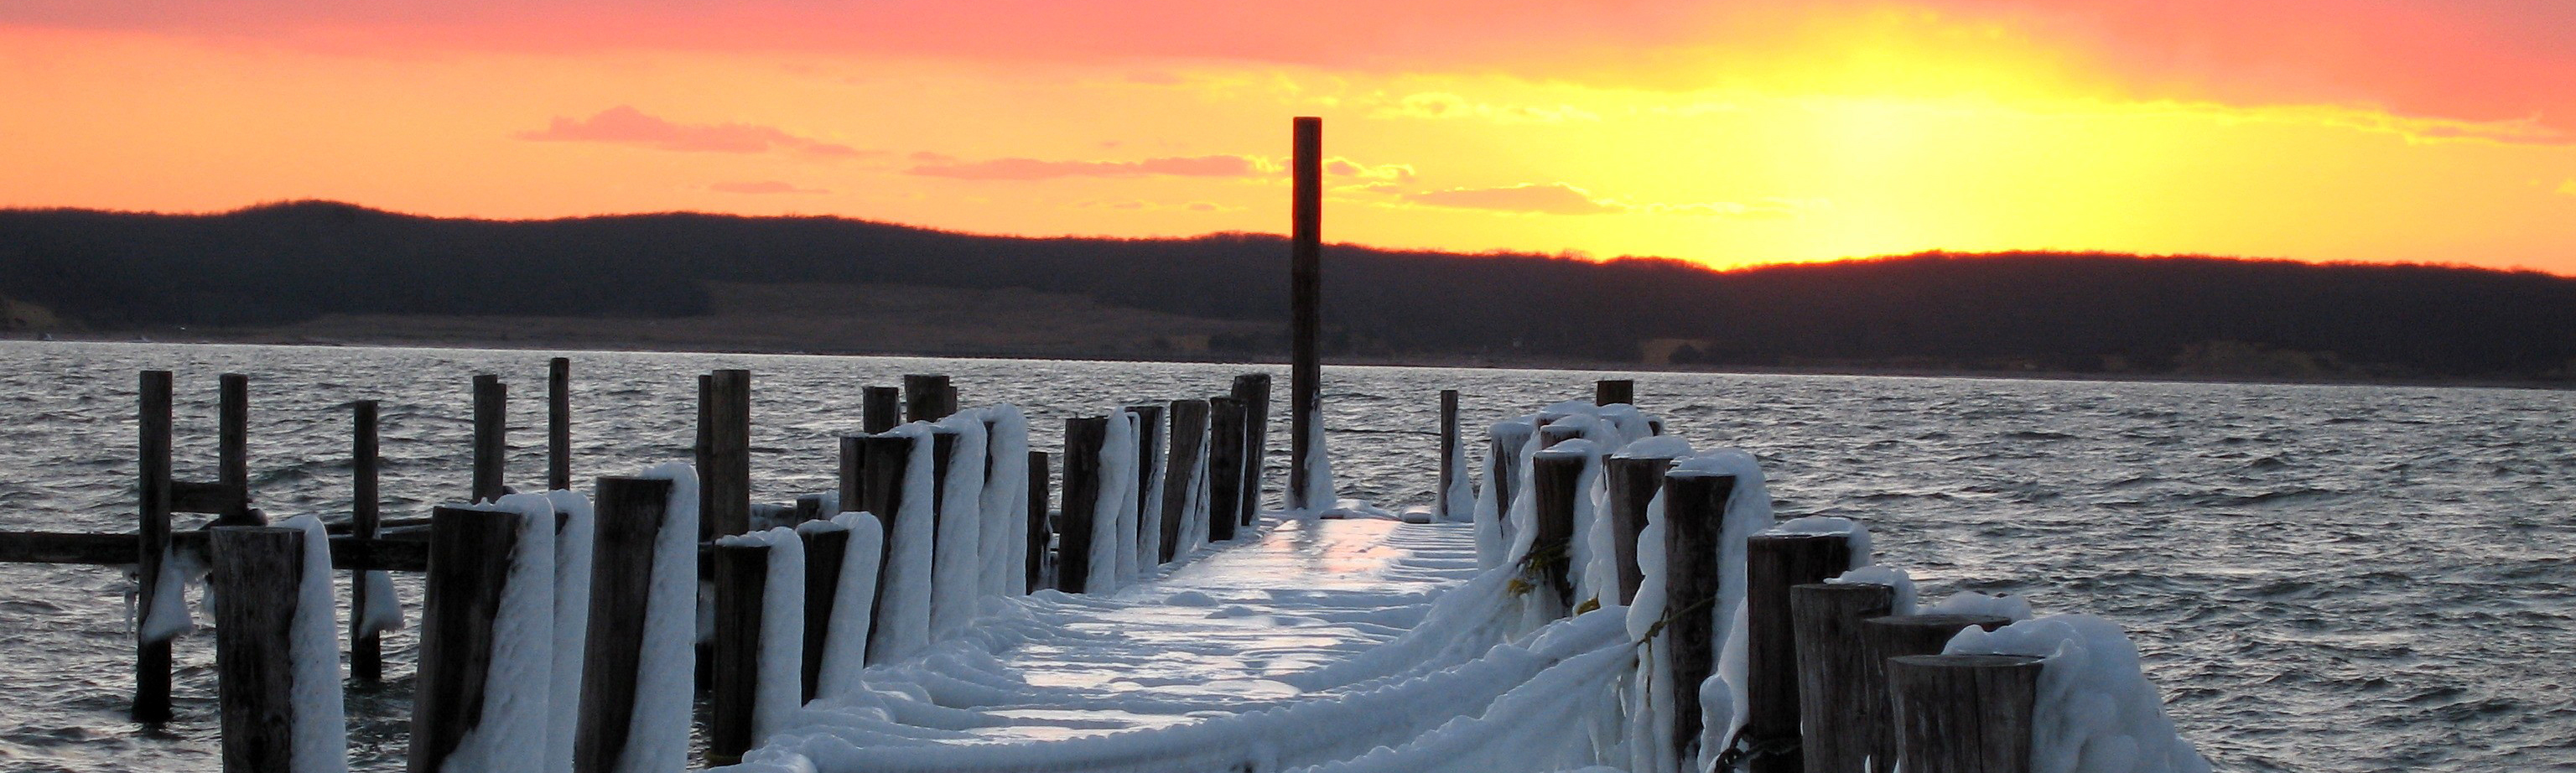 Pier on Long Island in the winter